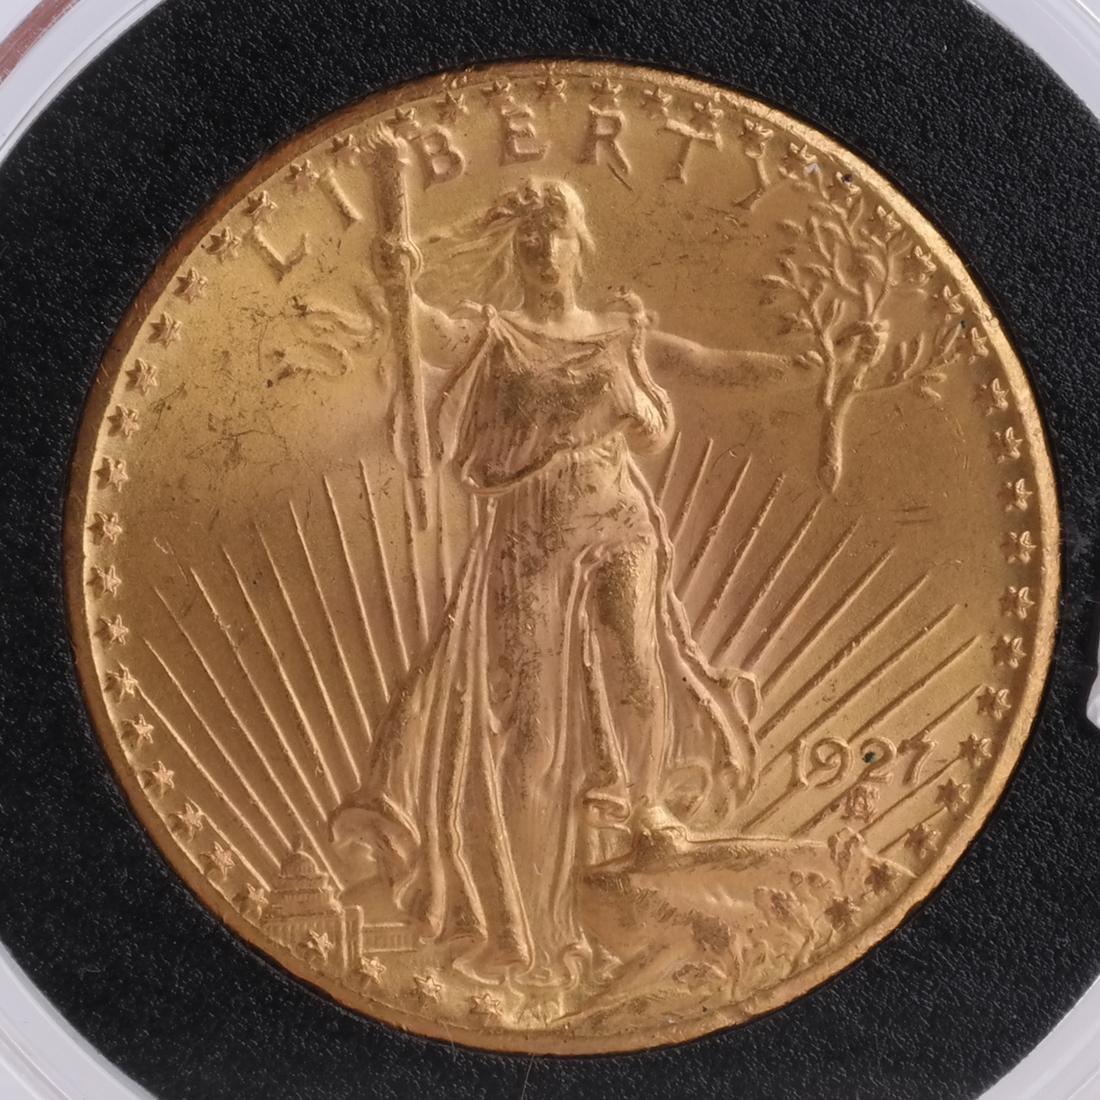 1927 $20 Gold Saint Gaudens, MS 63